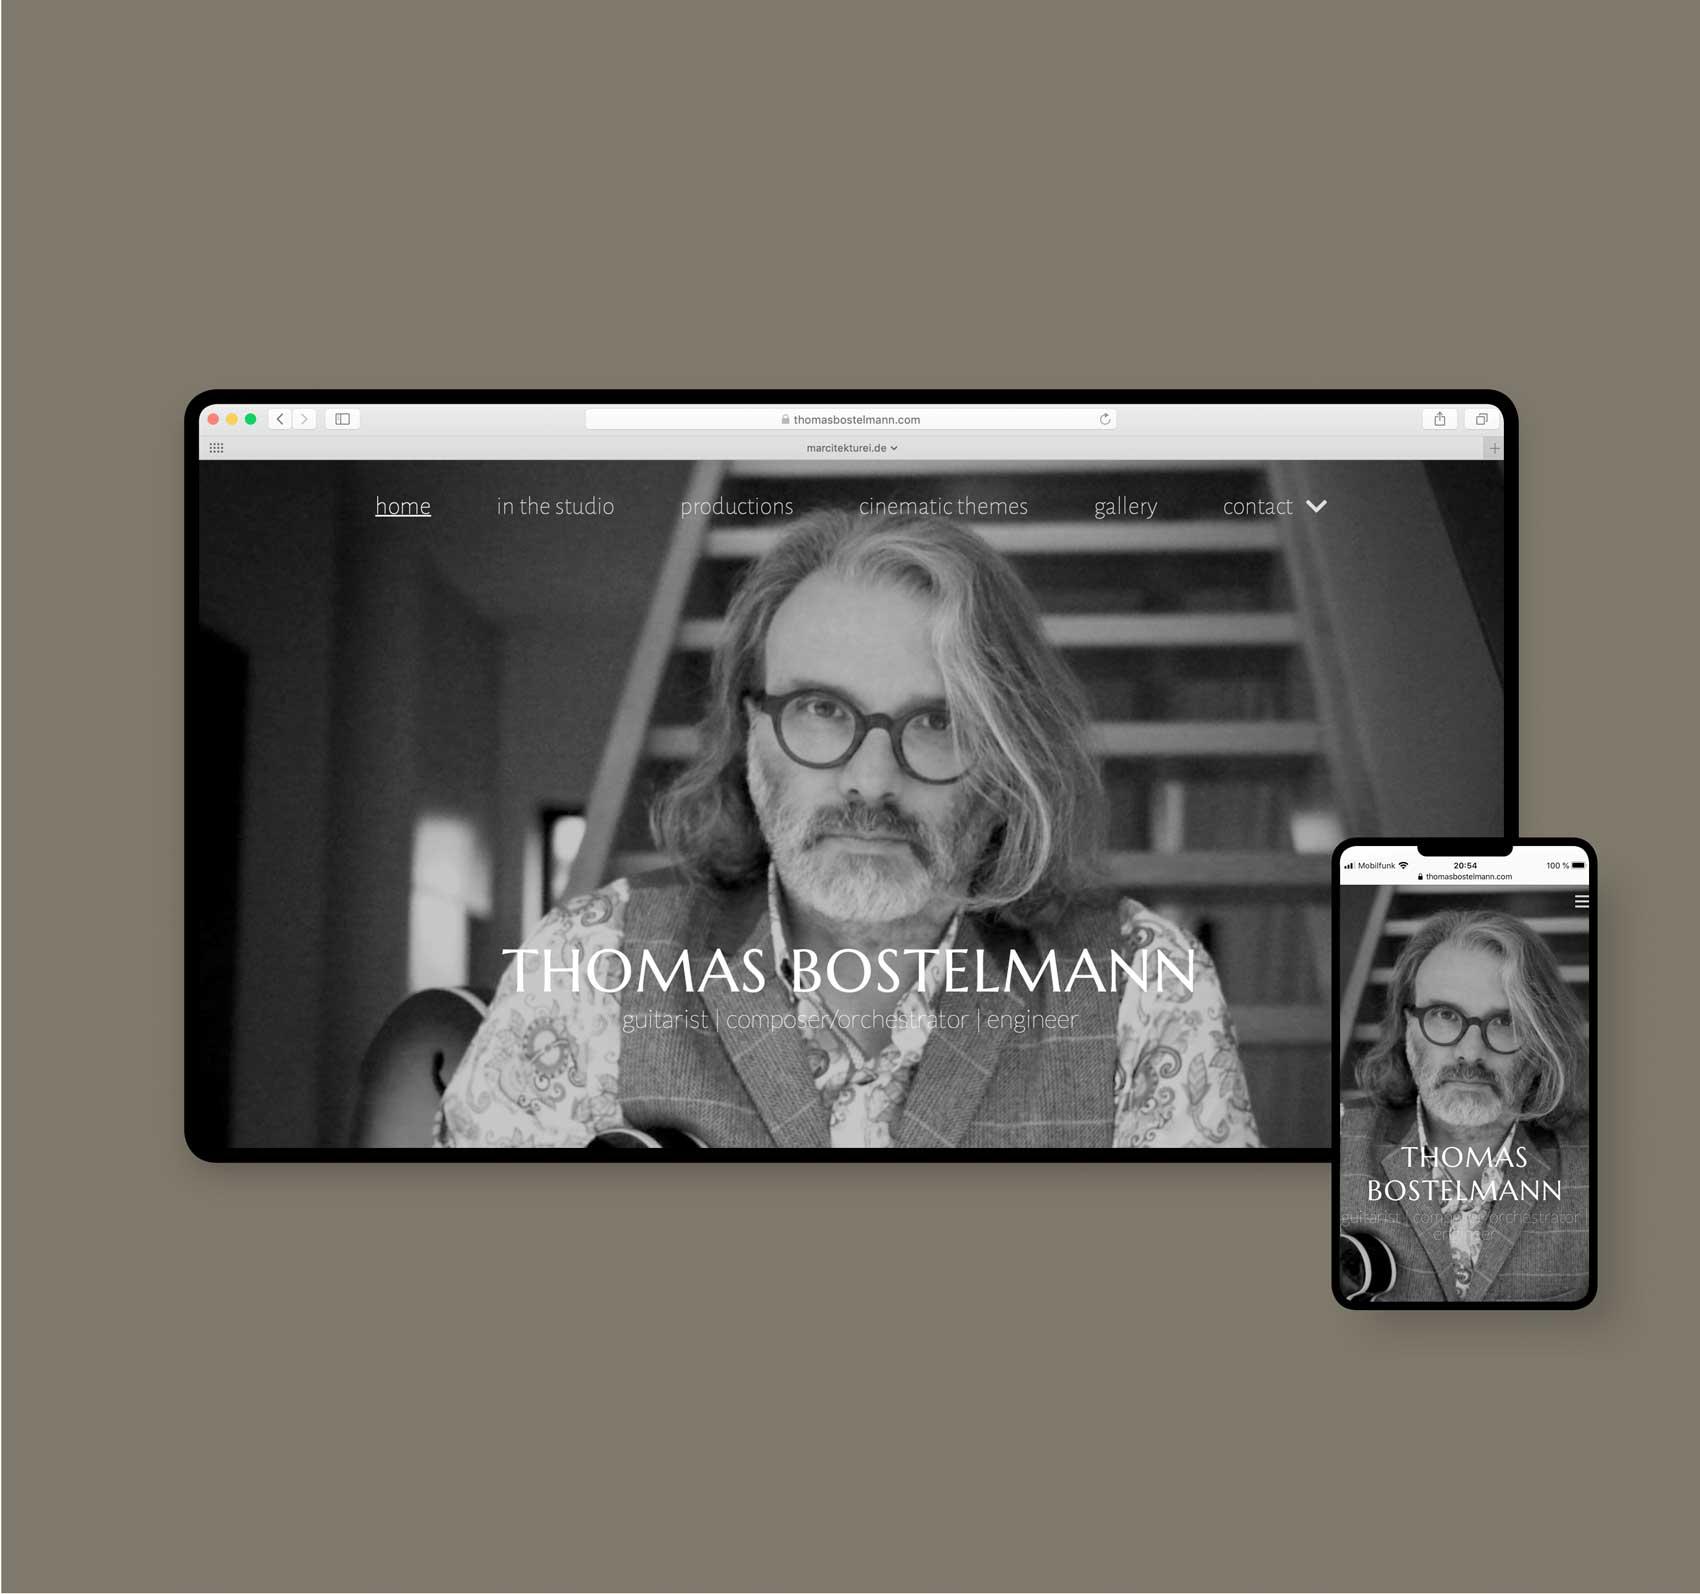 Thomas Bostelmann.com